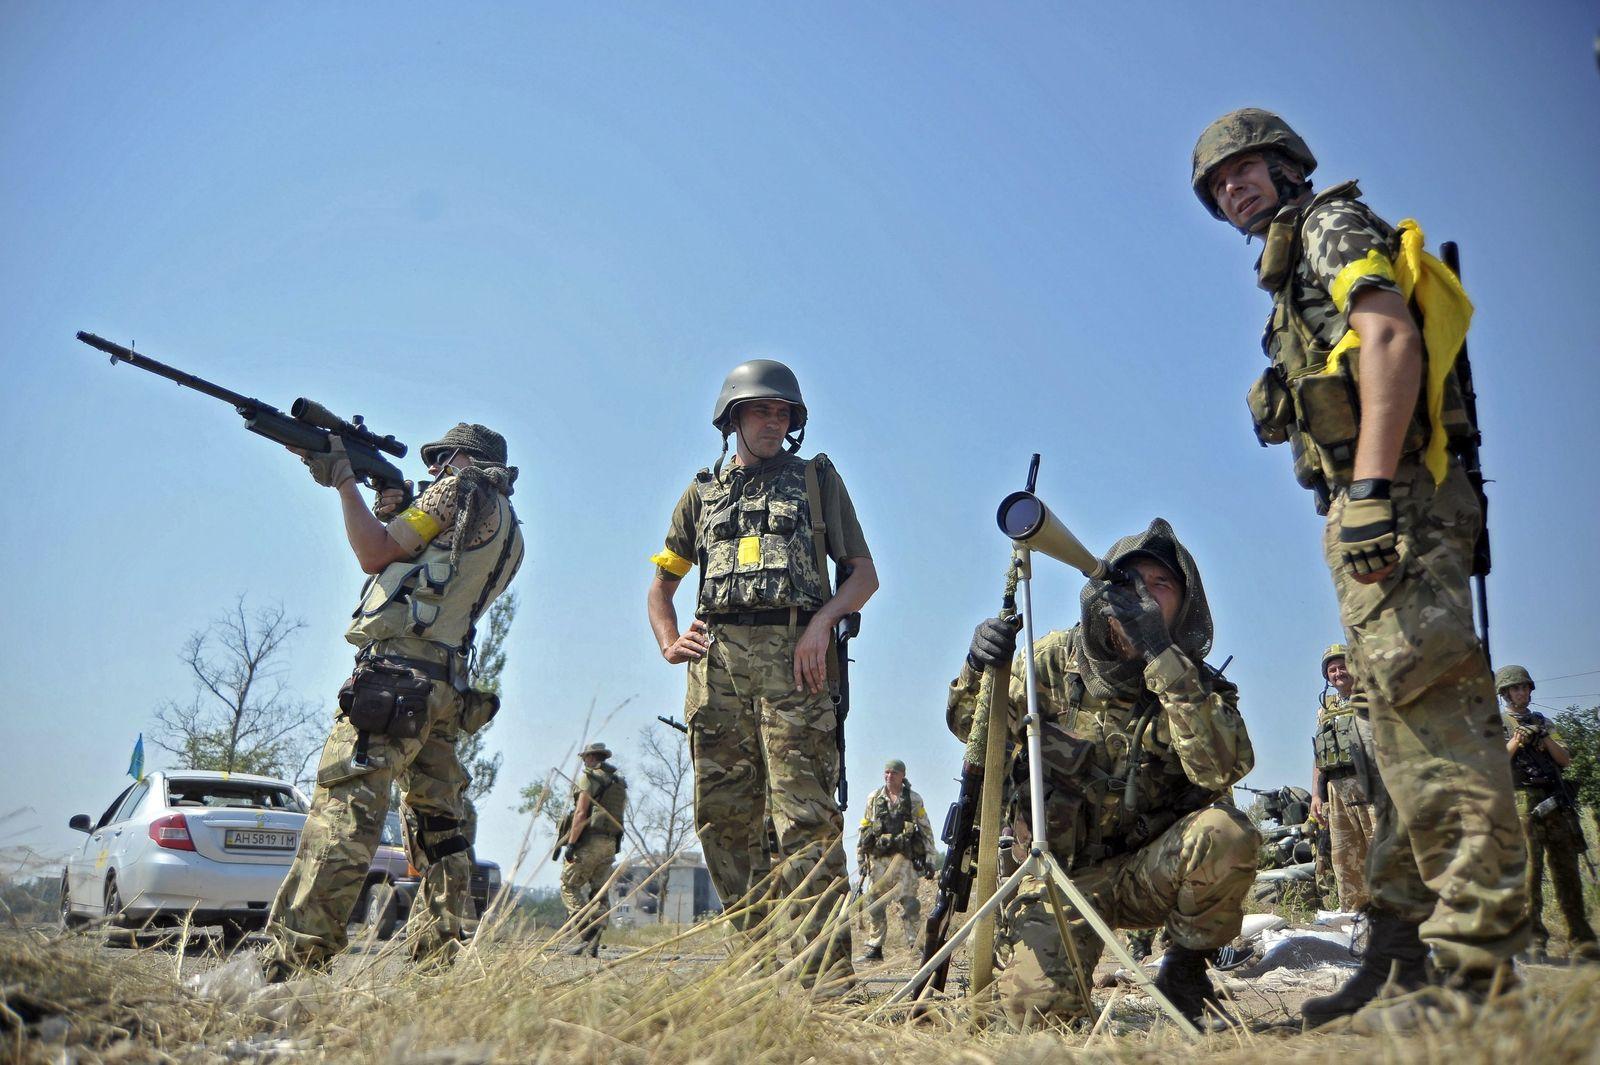 At least 19 killed, 97 injured in eastern Ukraine fighting